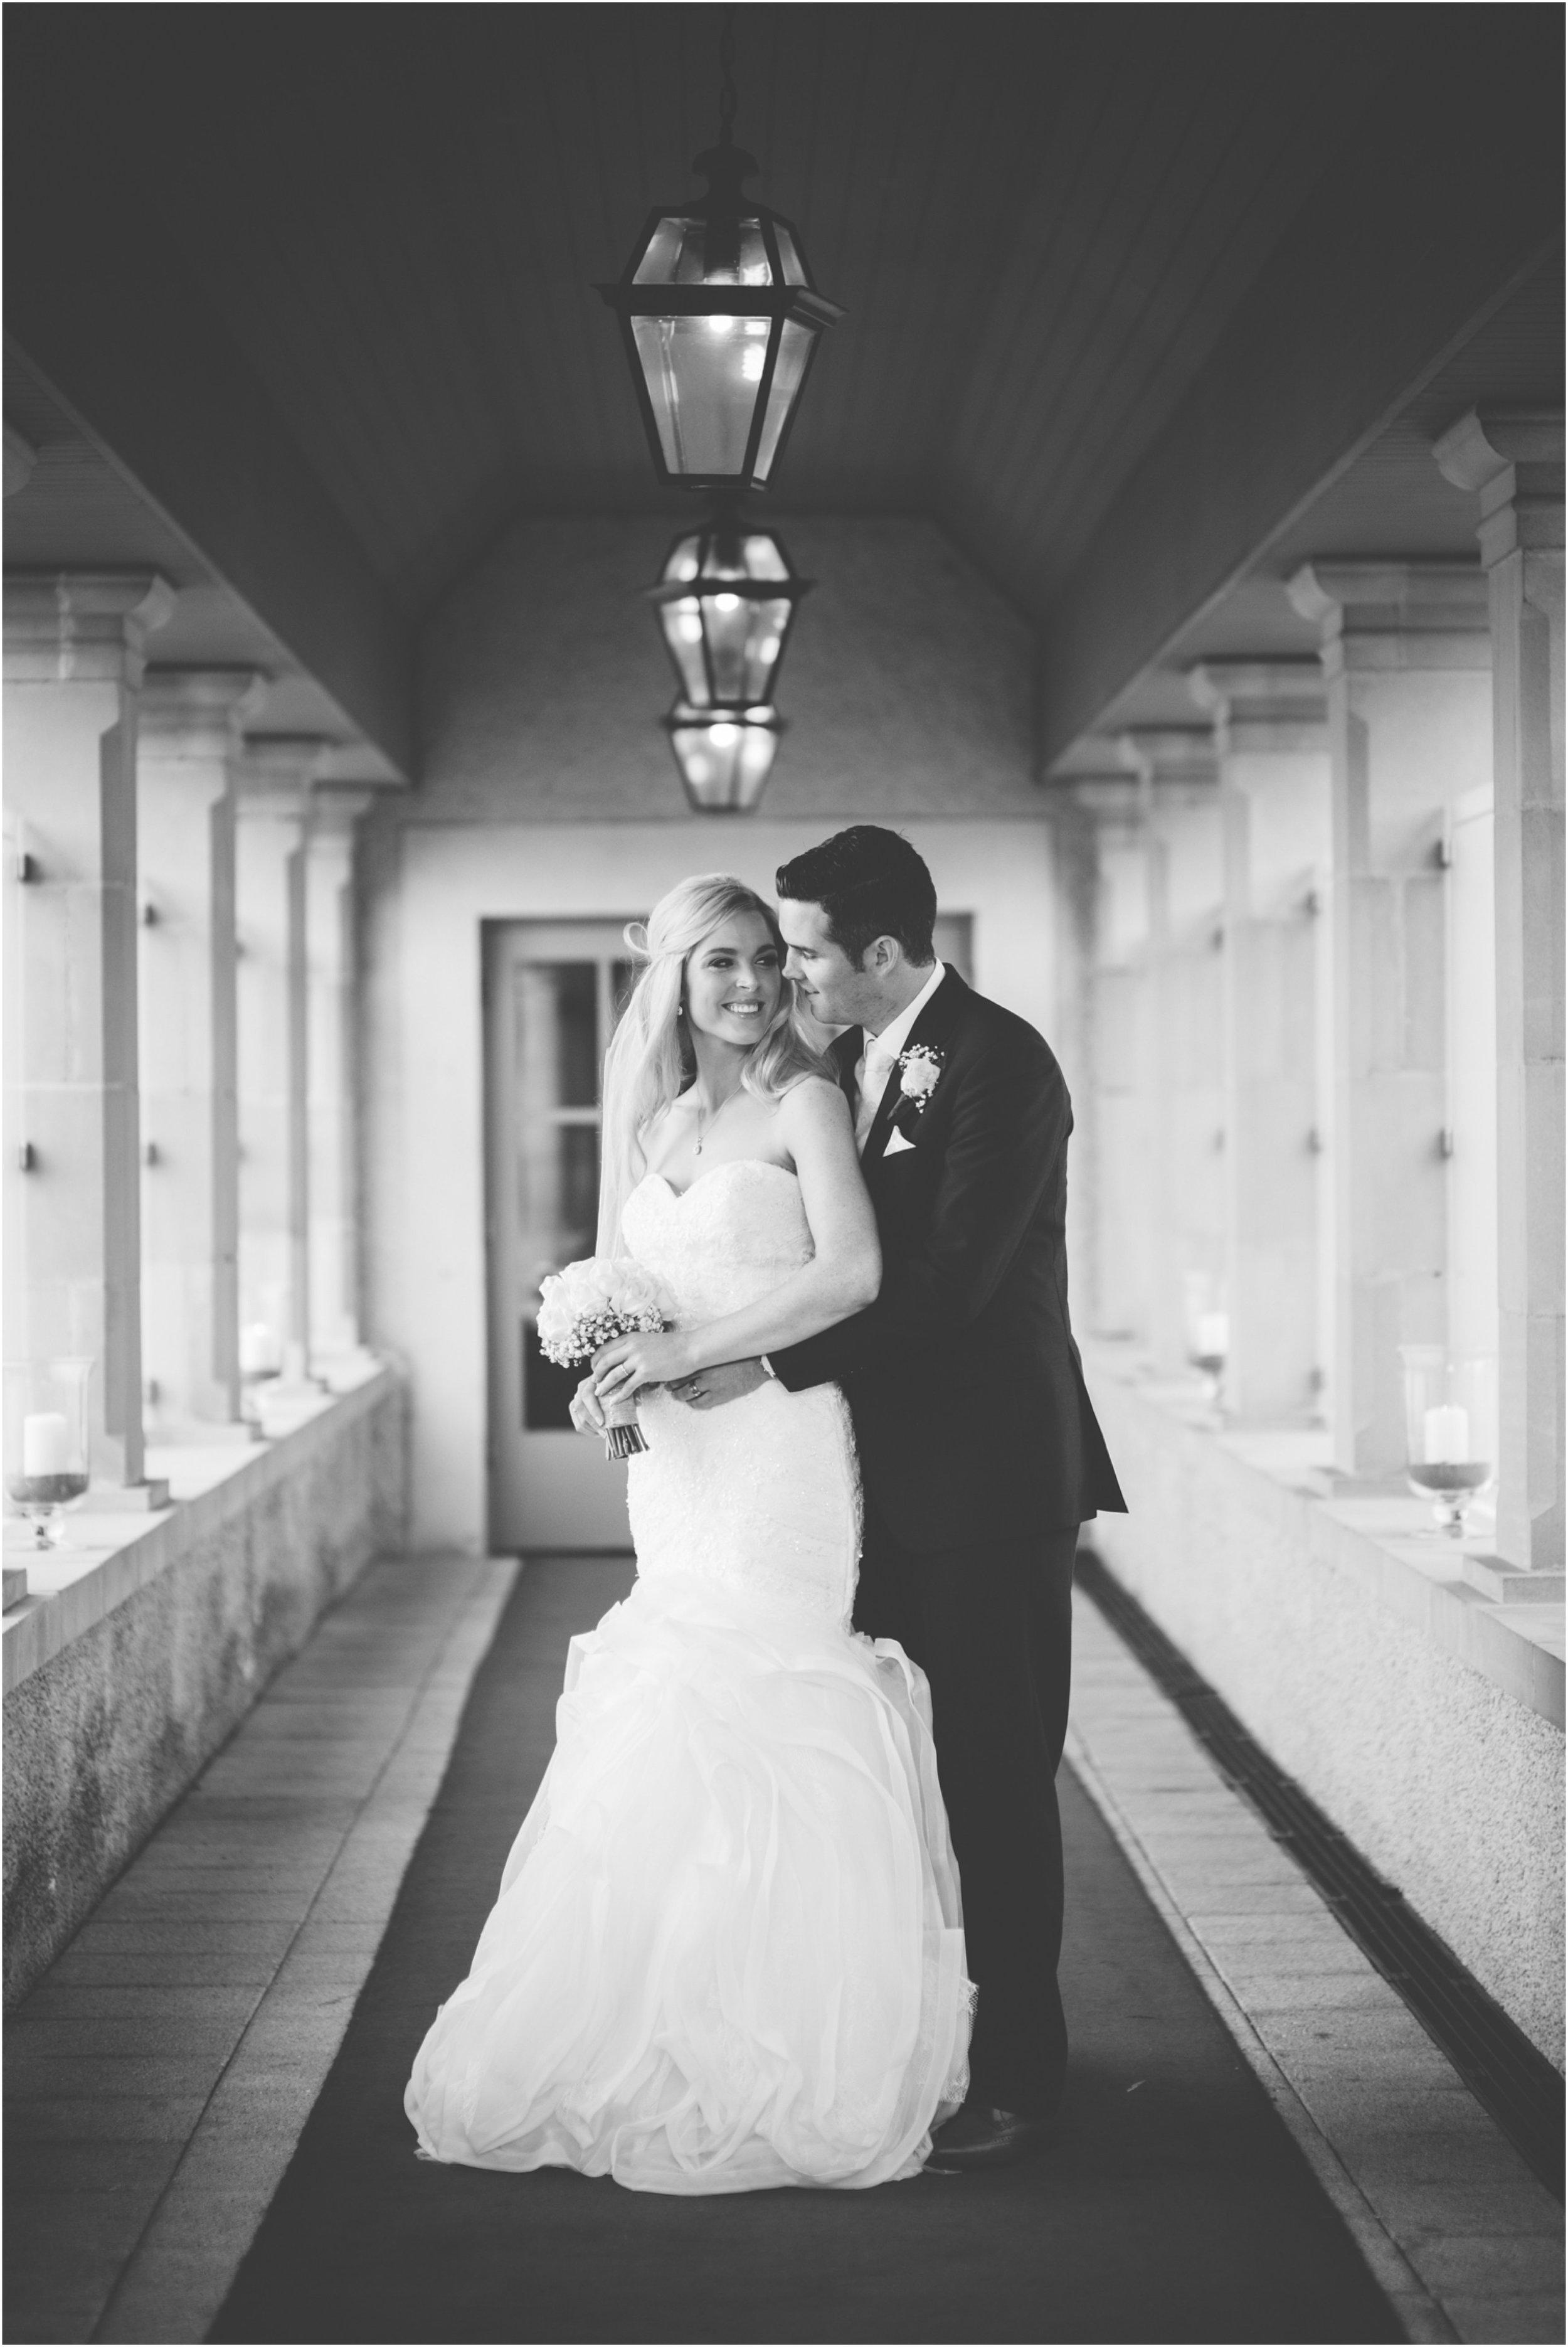 laura-lee-stephen-lough-erne-resort-wedding-photography-co-fermanagh_0043.jpg